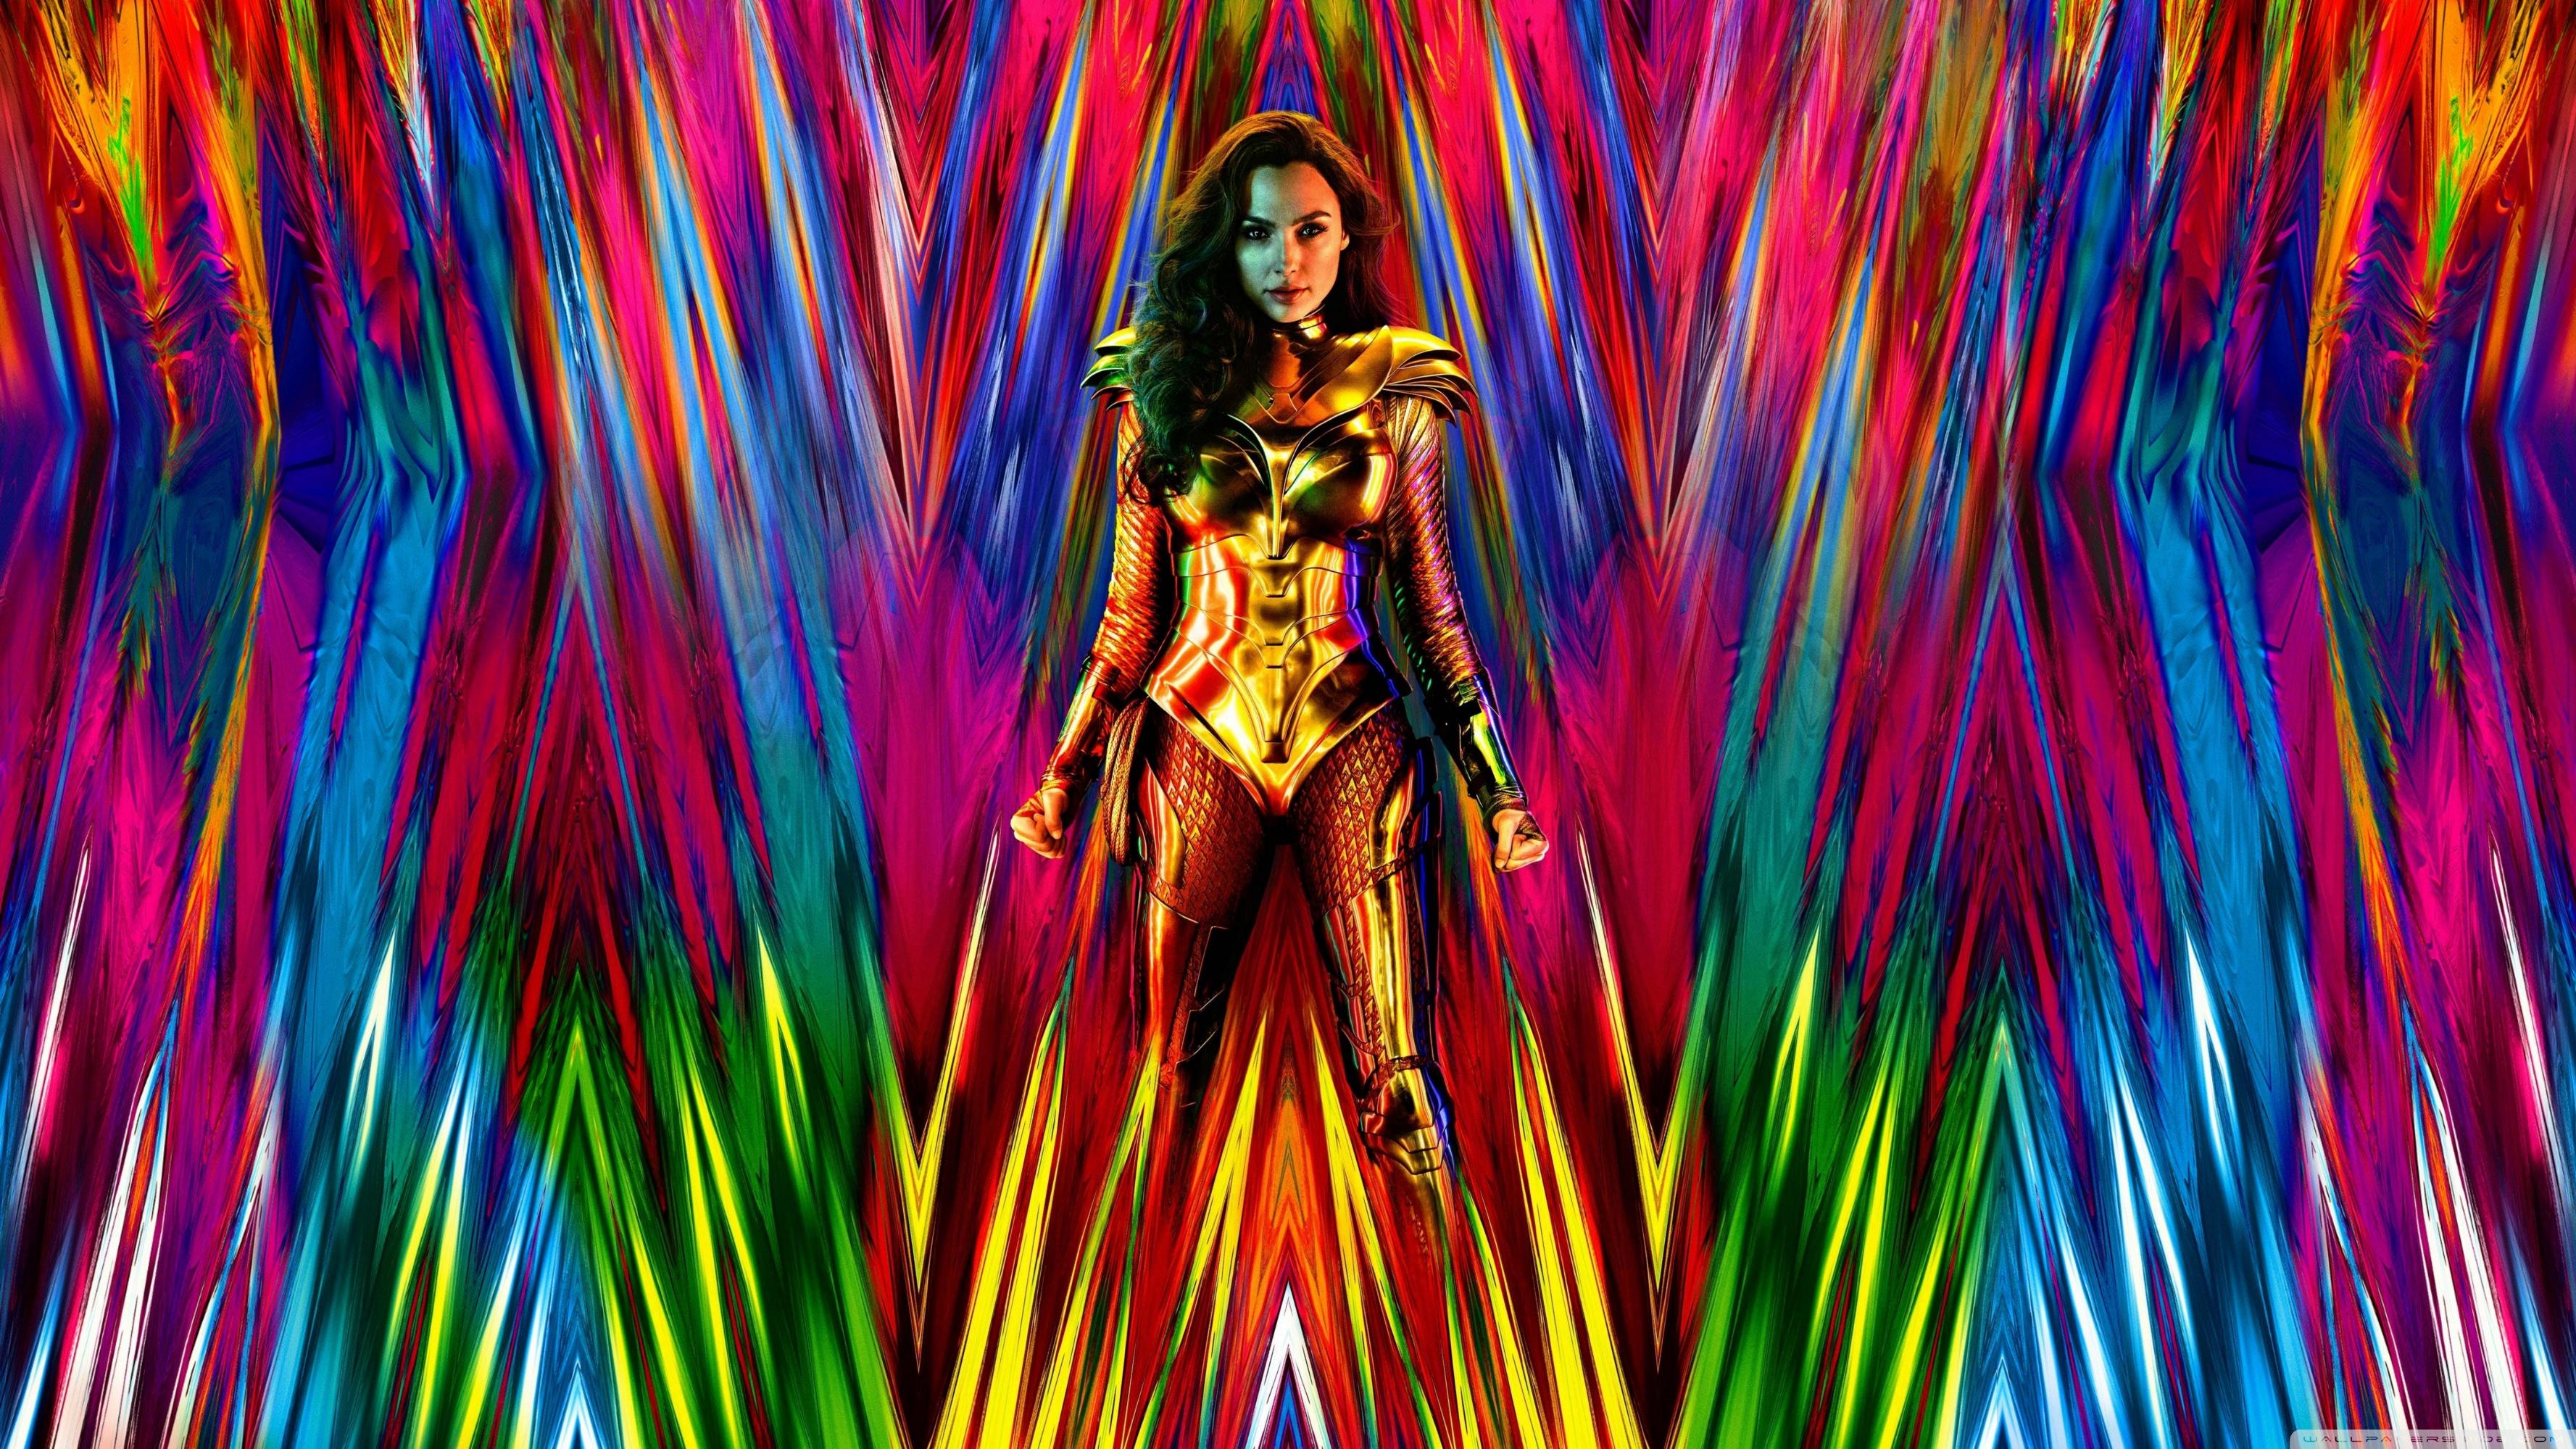 Wonder Woman 1984 Movie 2020 Ultra HD Desktop Background Wallpaper 3554x1999